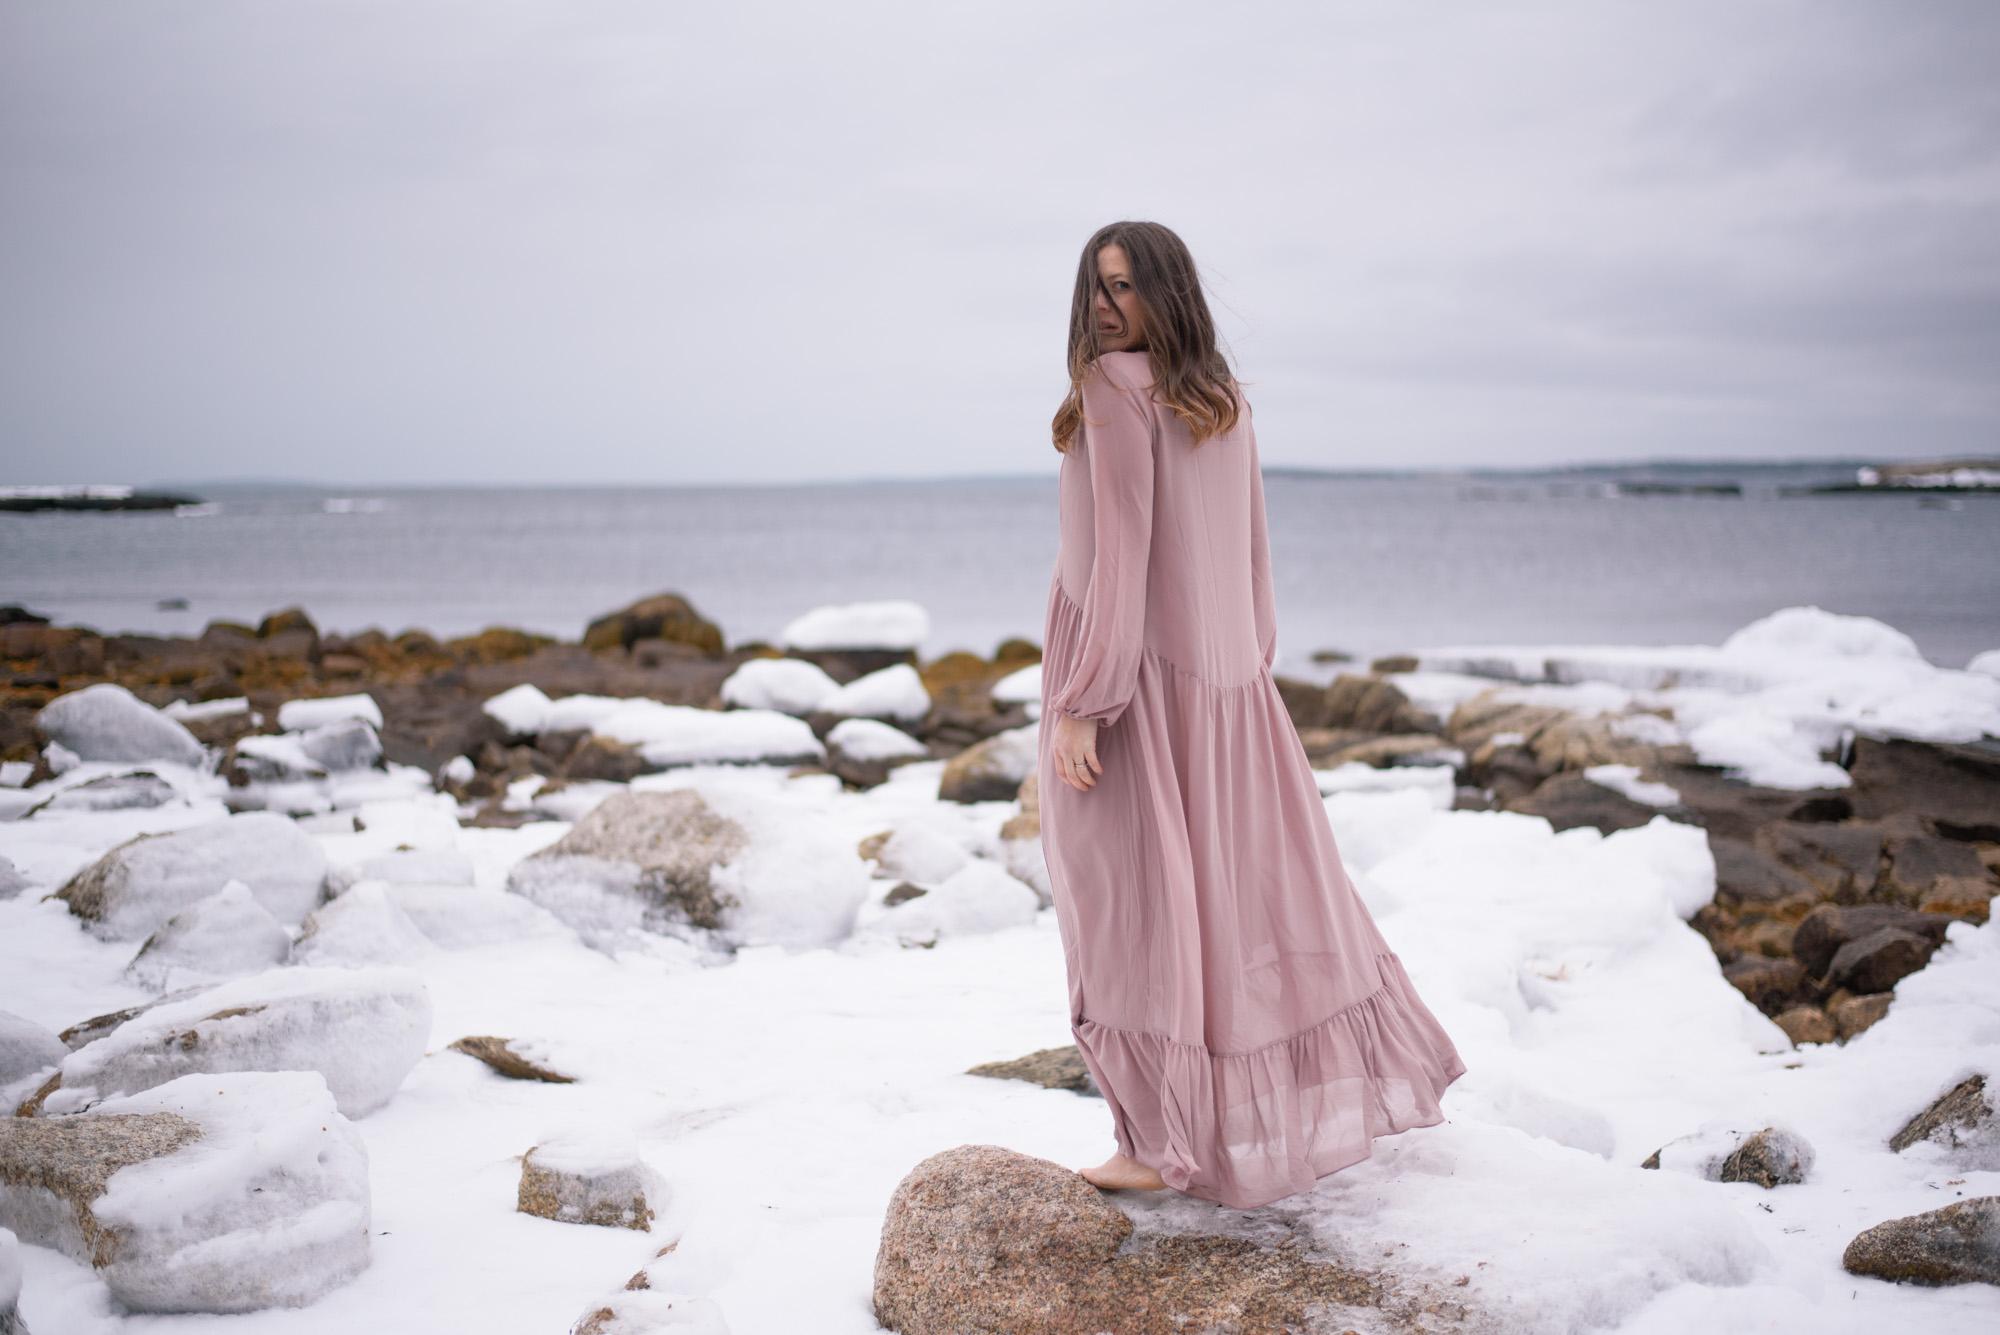 Wild Rosebuds: Our stay at Oceanstoe Seaside Resort in Peggy's Cove, Nova Scotia